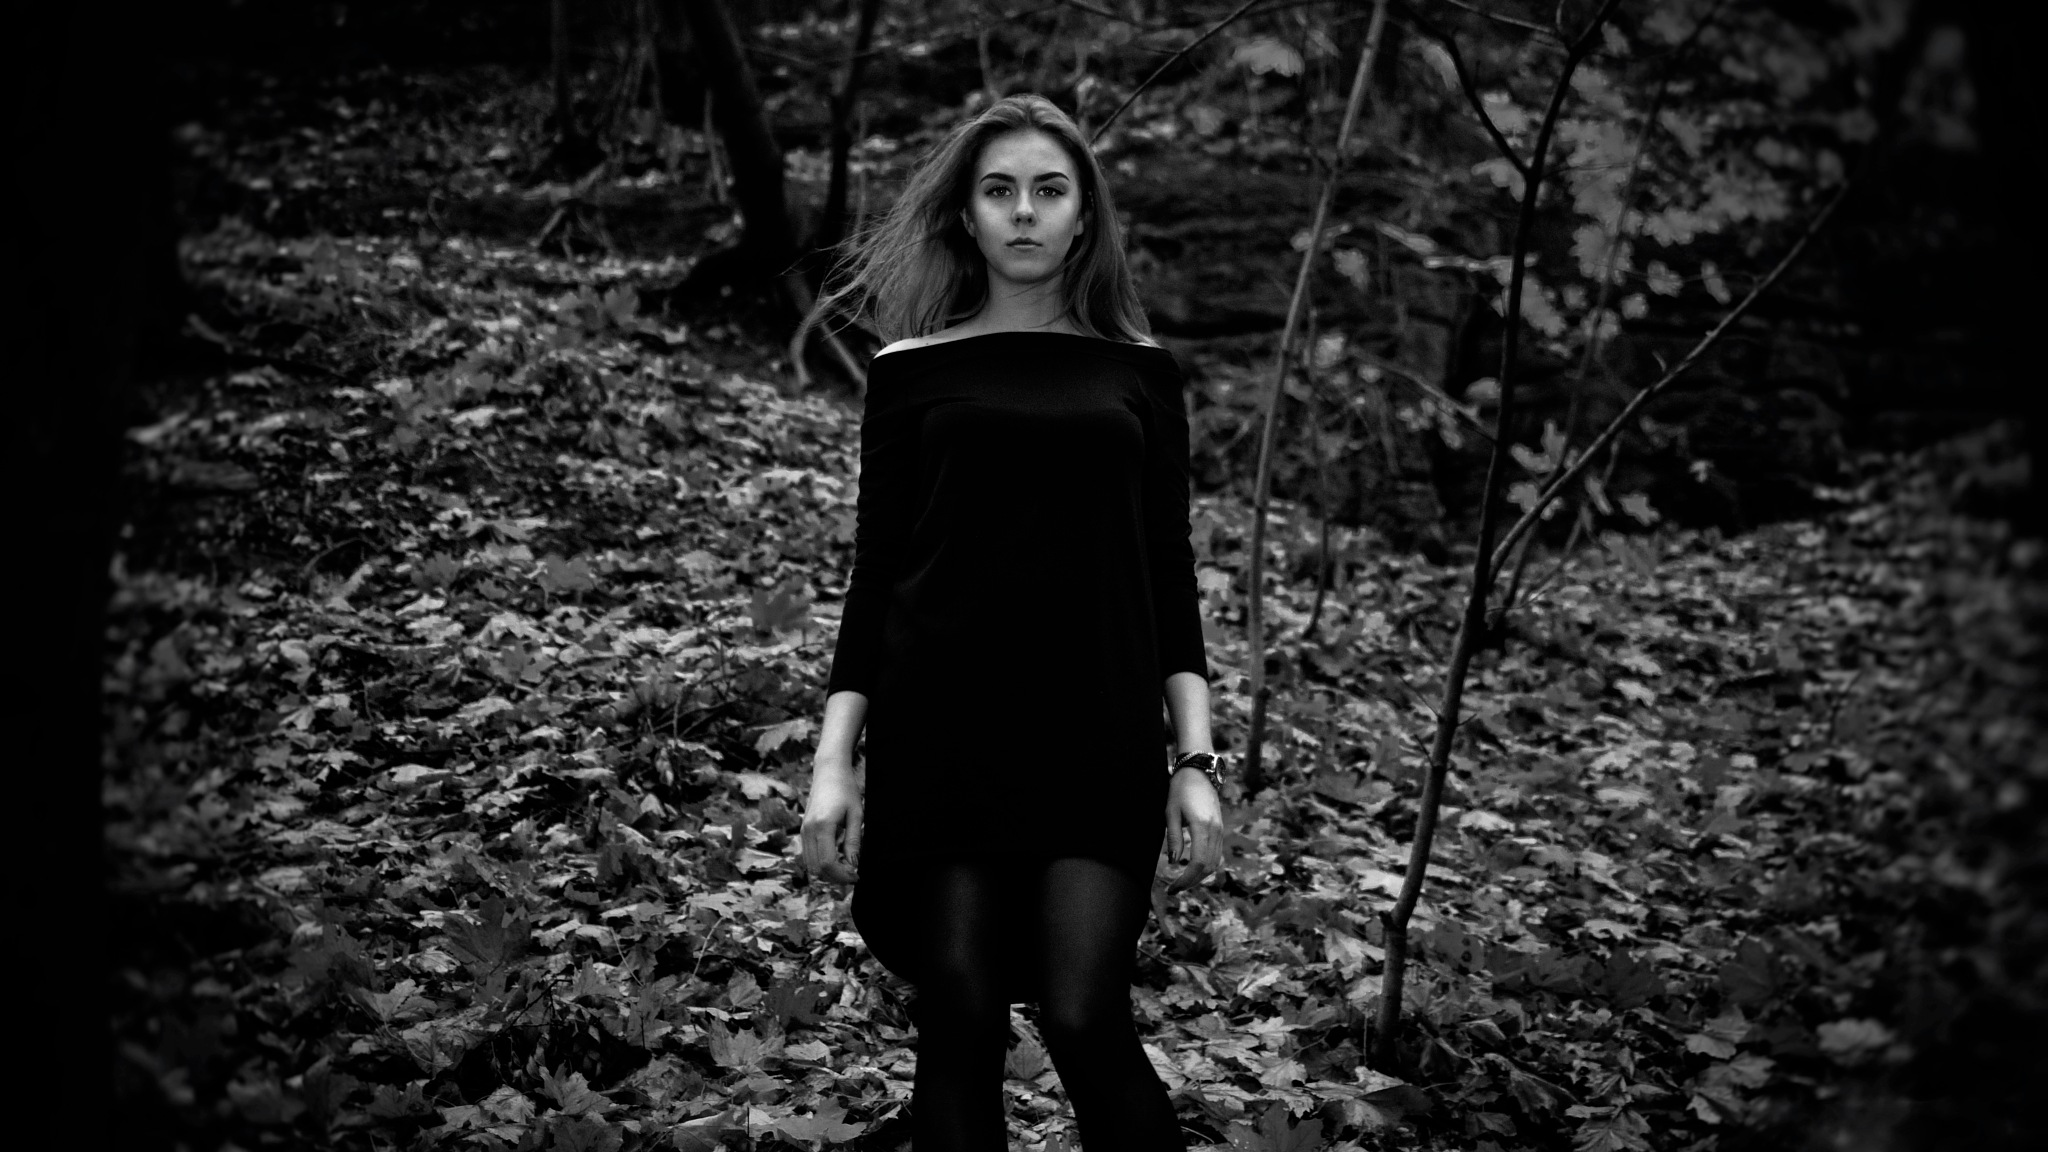 Angelica by Dmitriy Inko